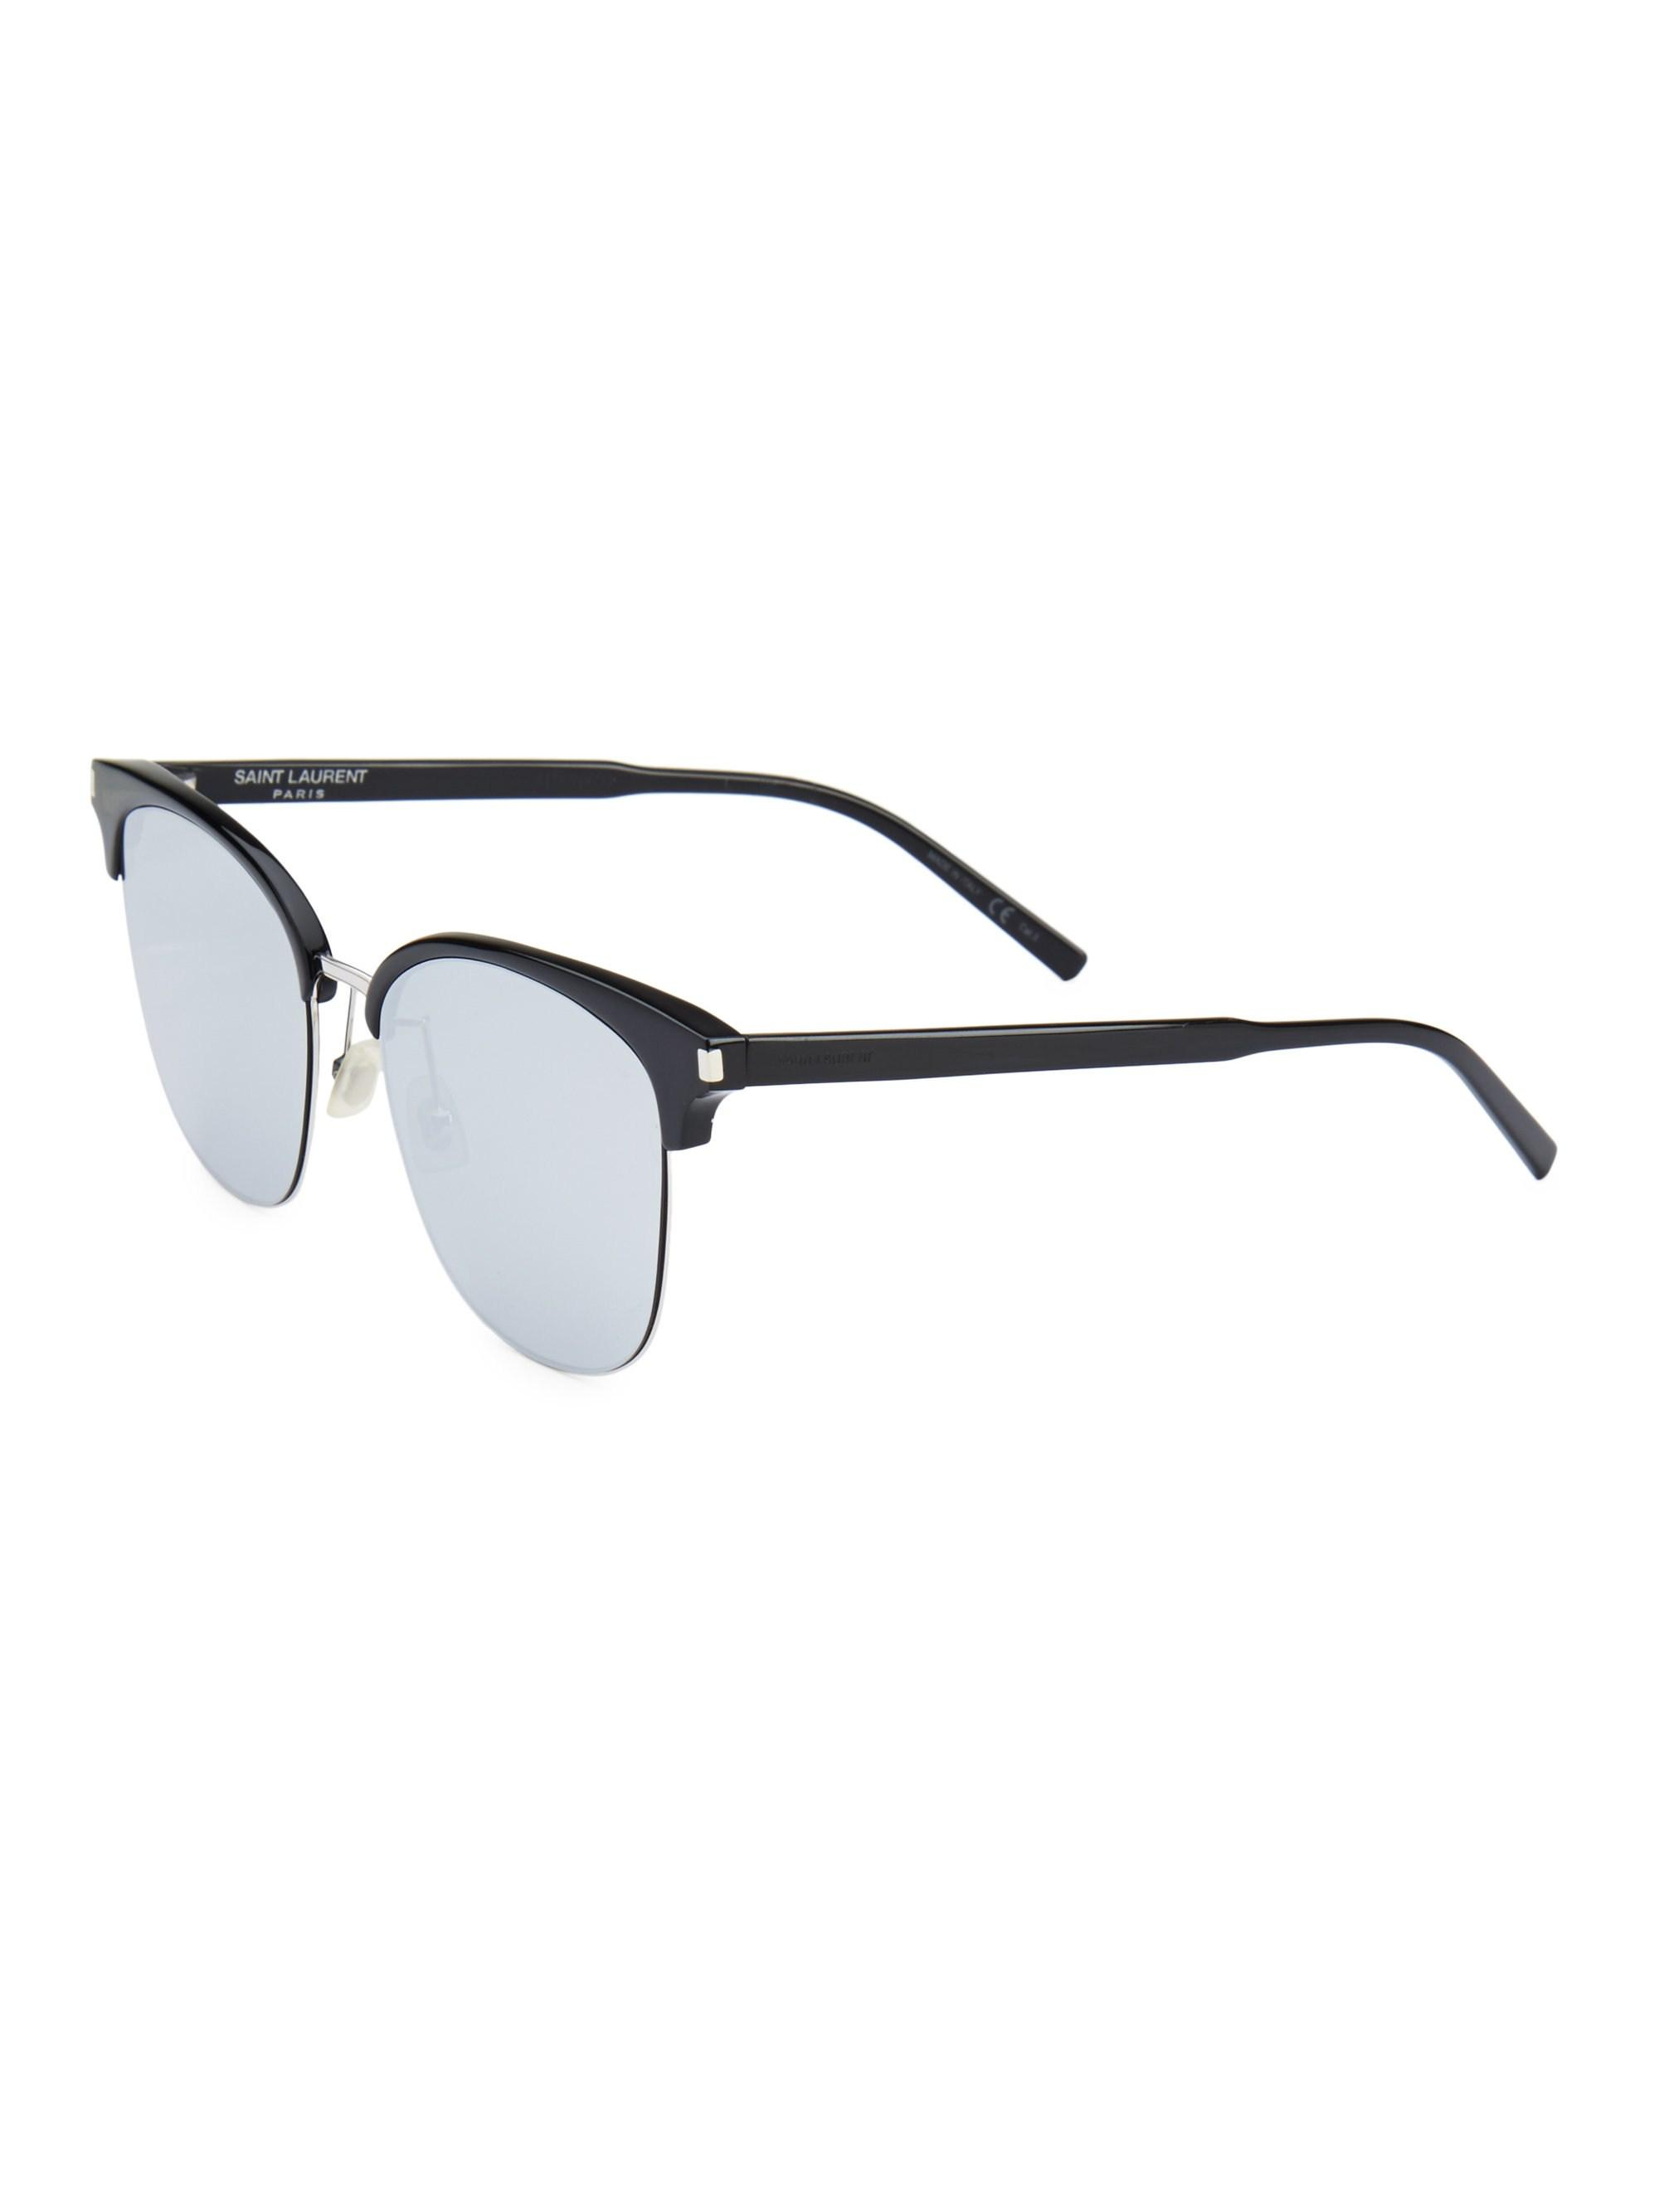 be5186daa79 Saint Laurent - Metallic Men s 57mm Clubmaster Sunglasses - Black Silver  for Men - Lyst. View fullscreen